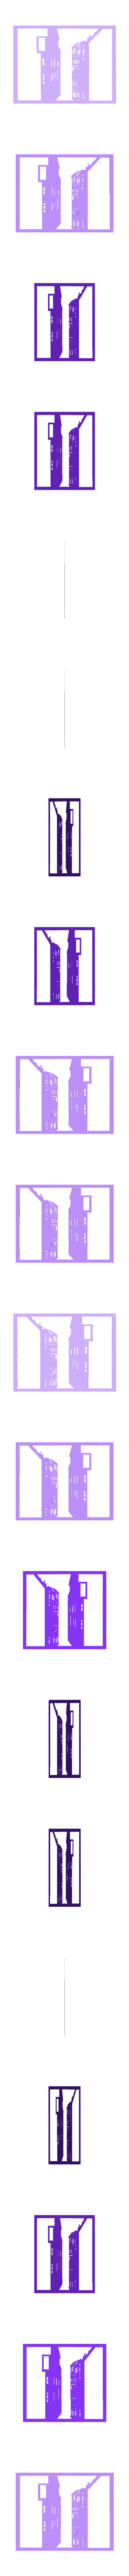 venecia5.STL Download free STL file lightbox venice • 3D printer template, gaevskiiy